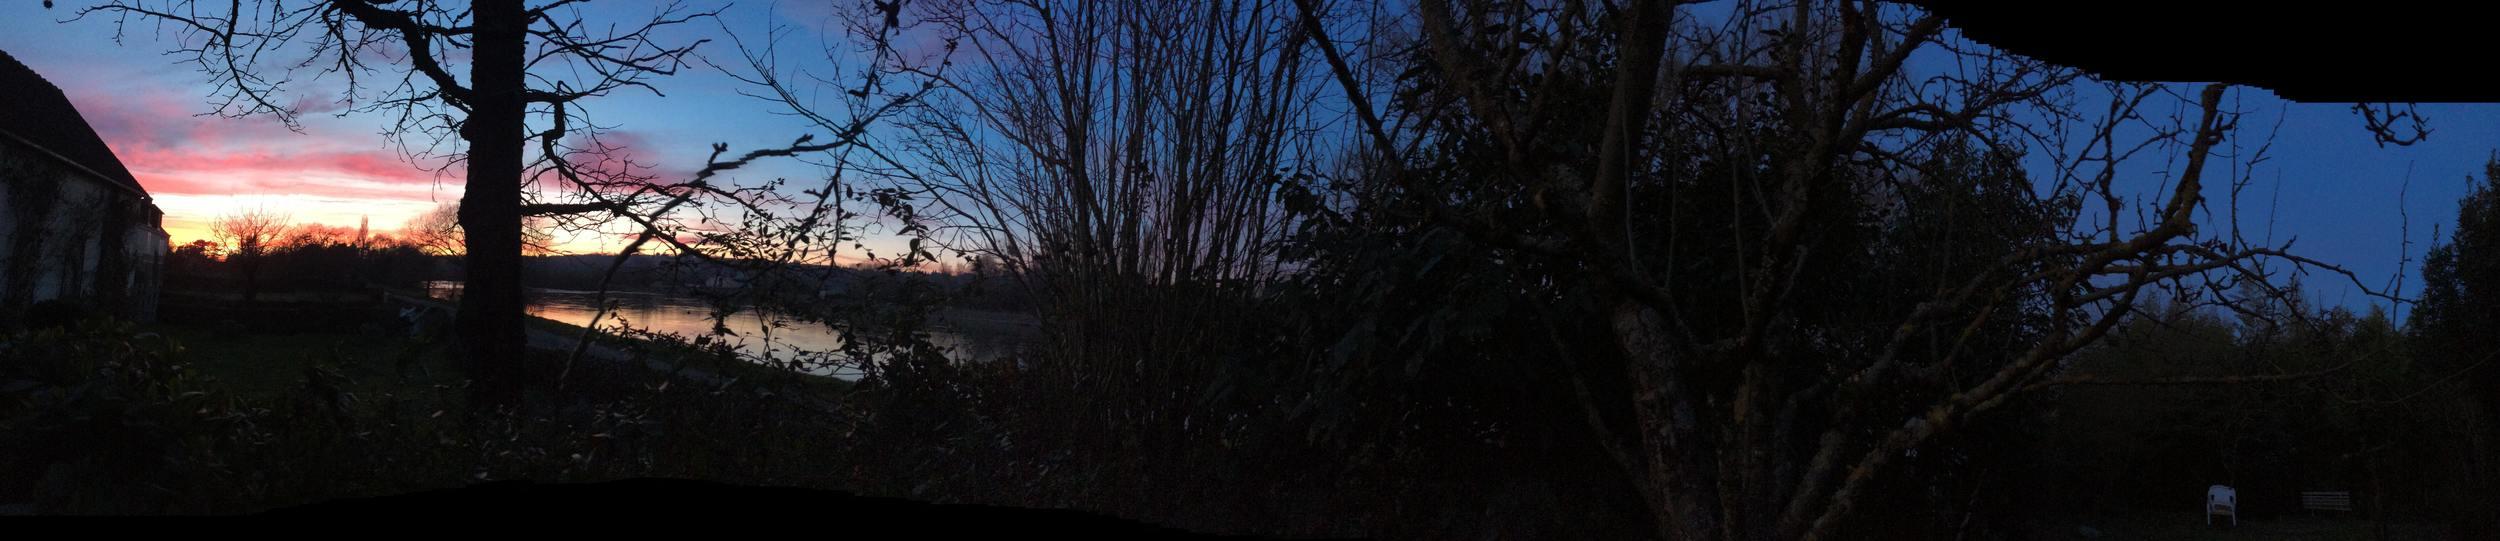 Root Matter Sunset_1  Photograph, 7 Mars 2015  ; copyright © Tennyson Woodbridge, 1963 to present